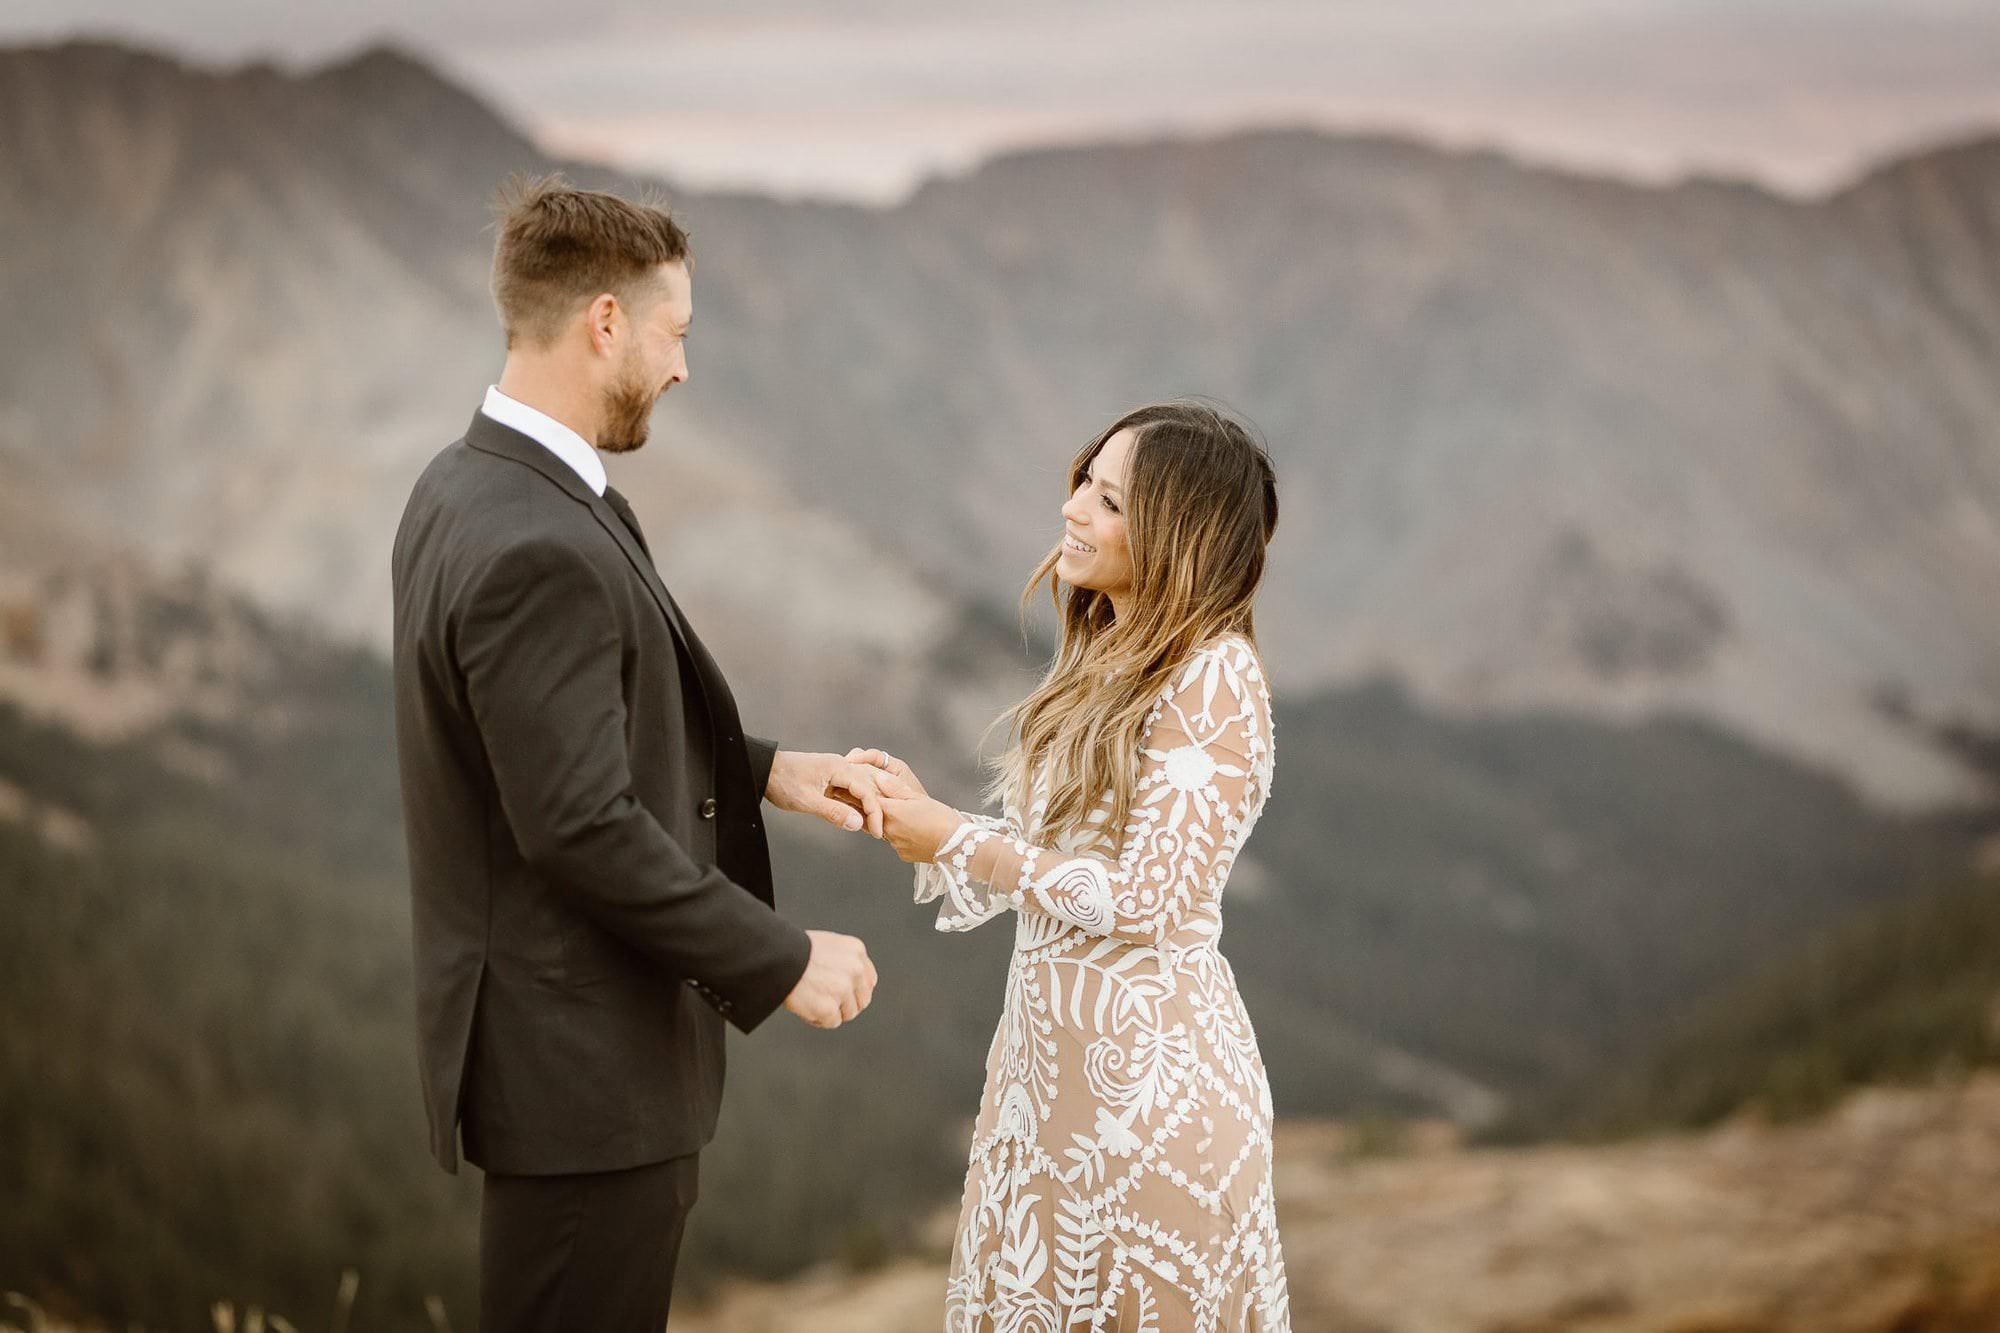 COLORADO ELOPEMENT PHOTOGRAPHER|COLORADO ADVENTURE ELOPEMENT|ROCKY MOUNTAIN NATIONAL PARK INTIMATE WEDDING|RMNP ELOPEMENT| COLORADO WEDDING PHOTOGRAPHER|Breckenridge Elopement